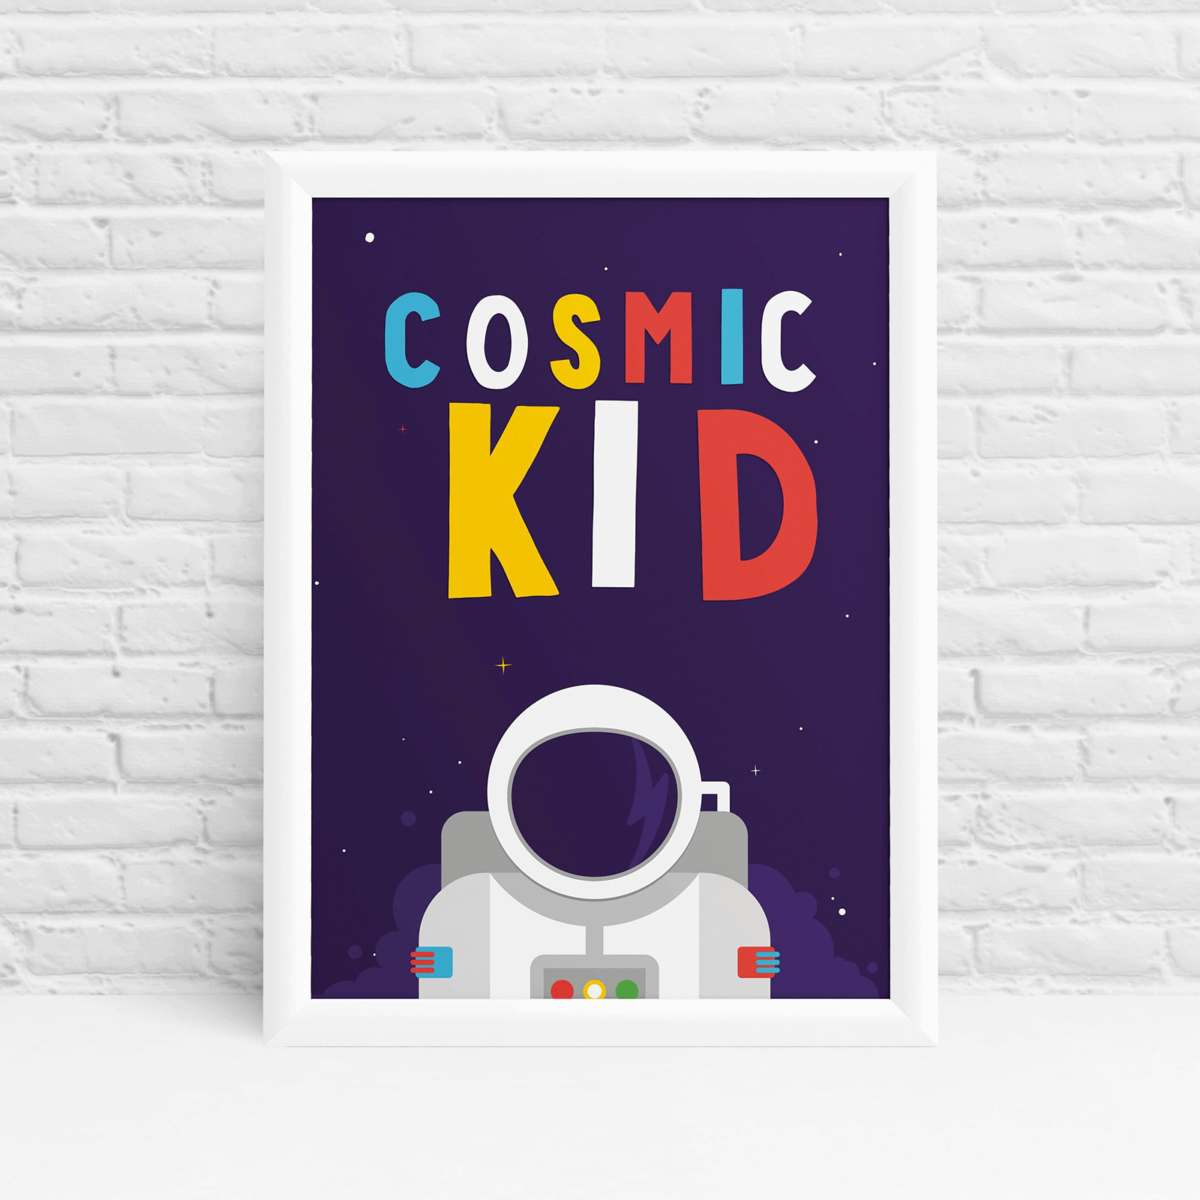 Cosmic kid spaceman little explorer astronaut print by Ibbleobble®